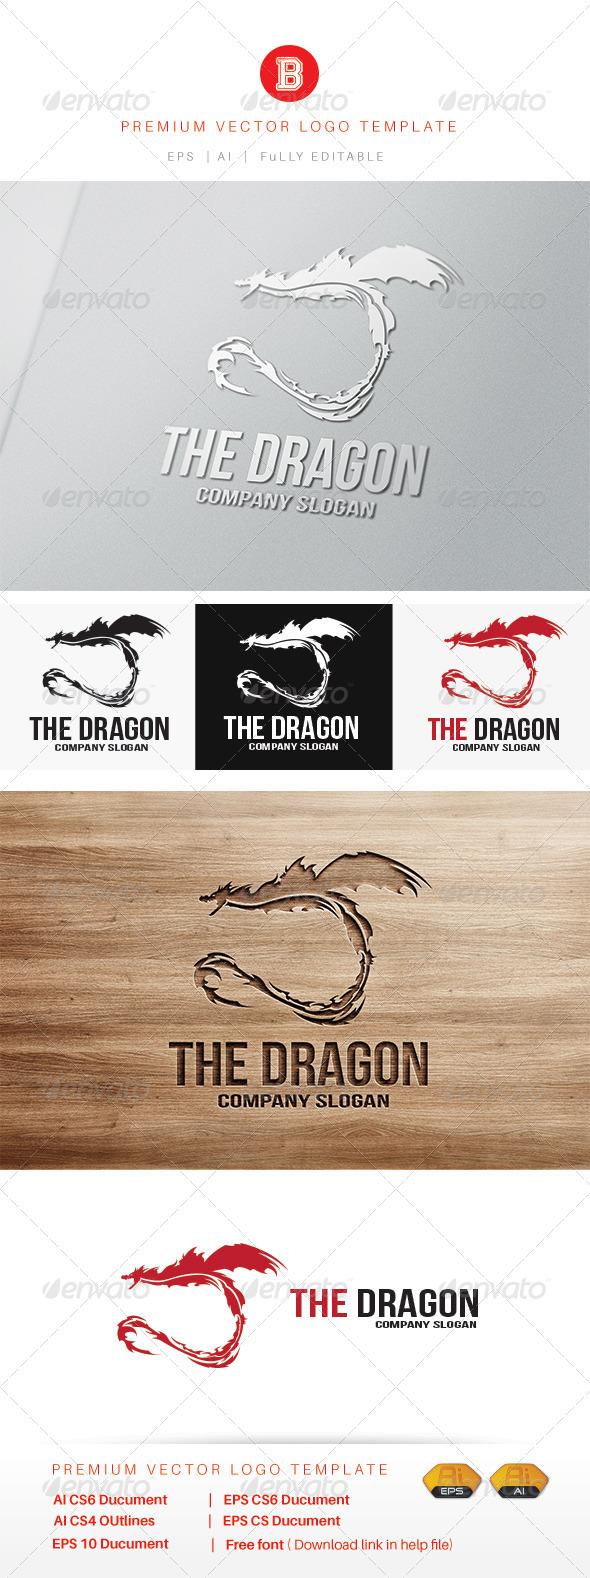 The Dragon V2